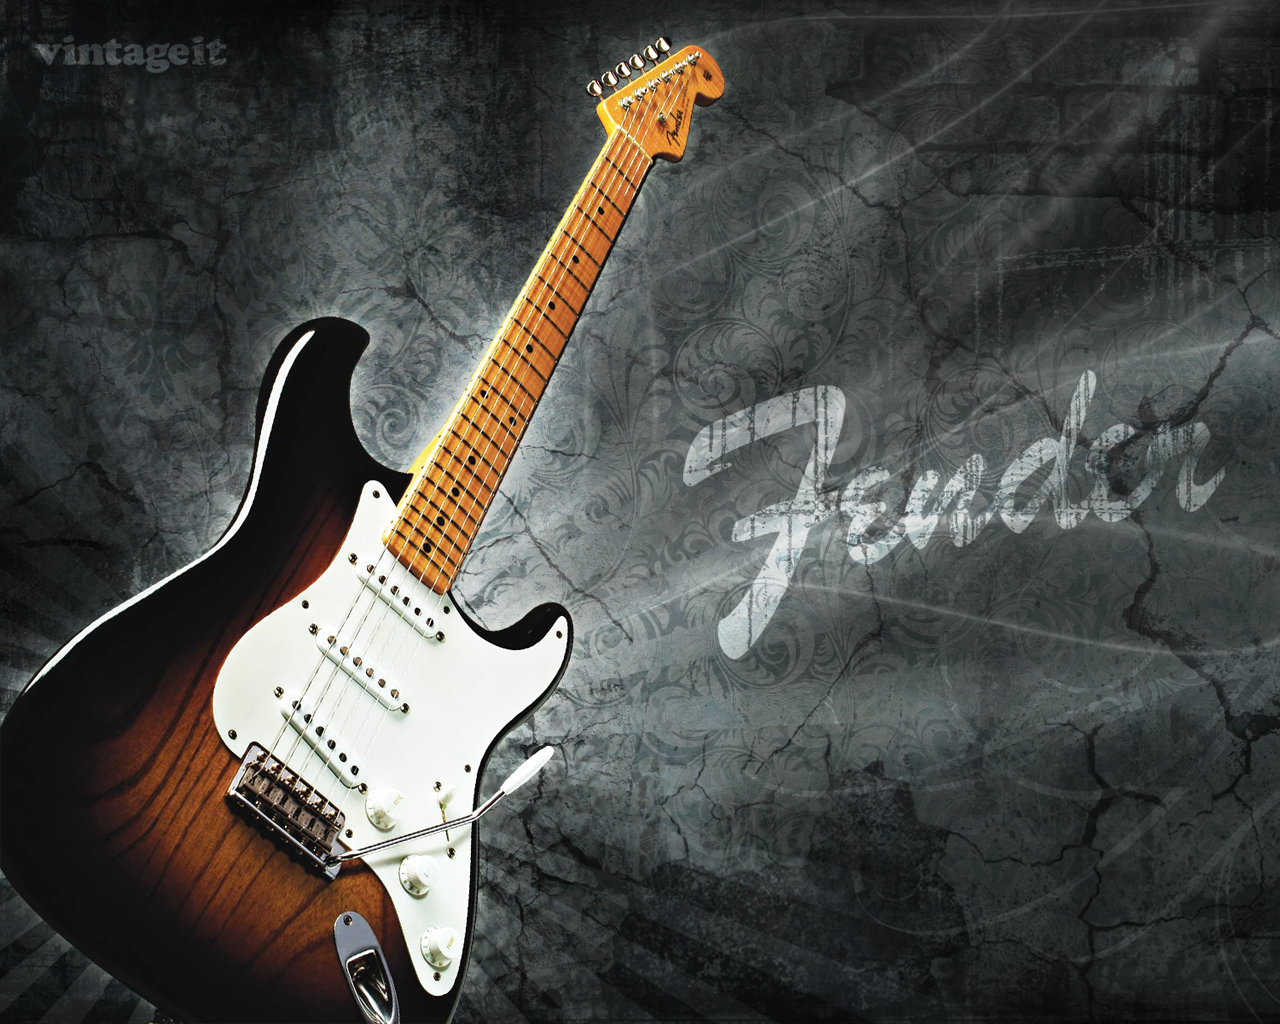 Fender Stratocaster wallpaper   Desktop HD iPad 1280x1024